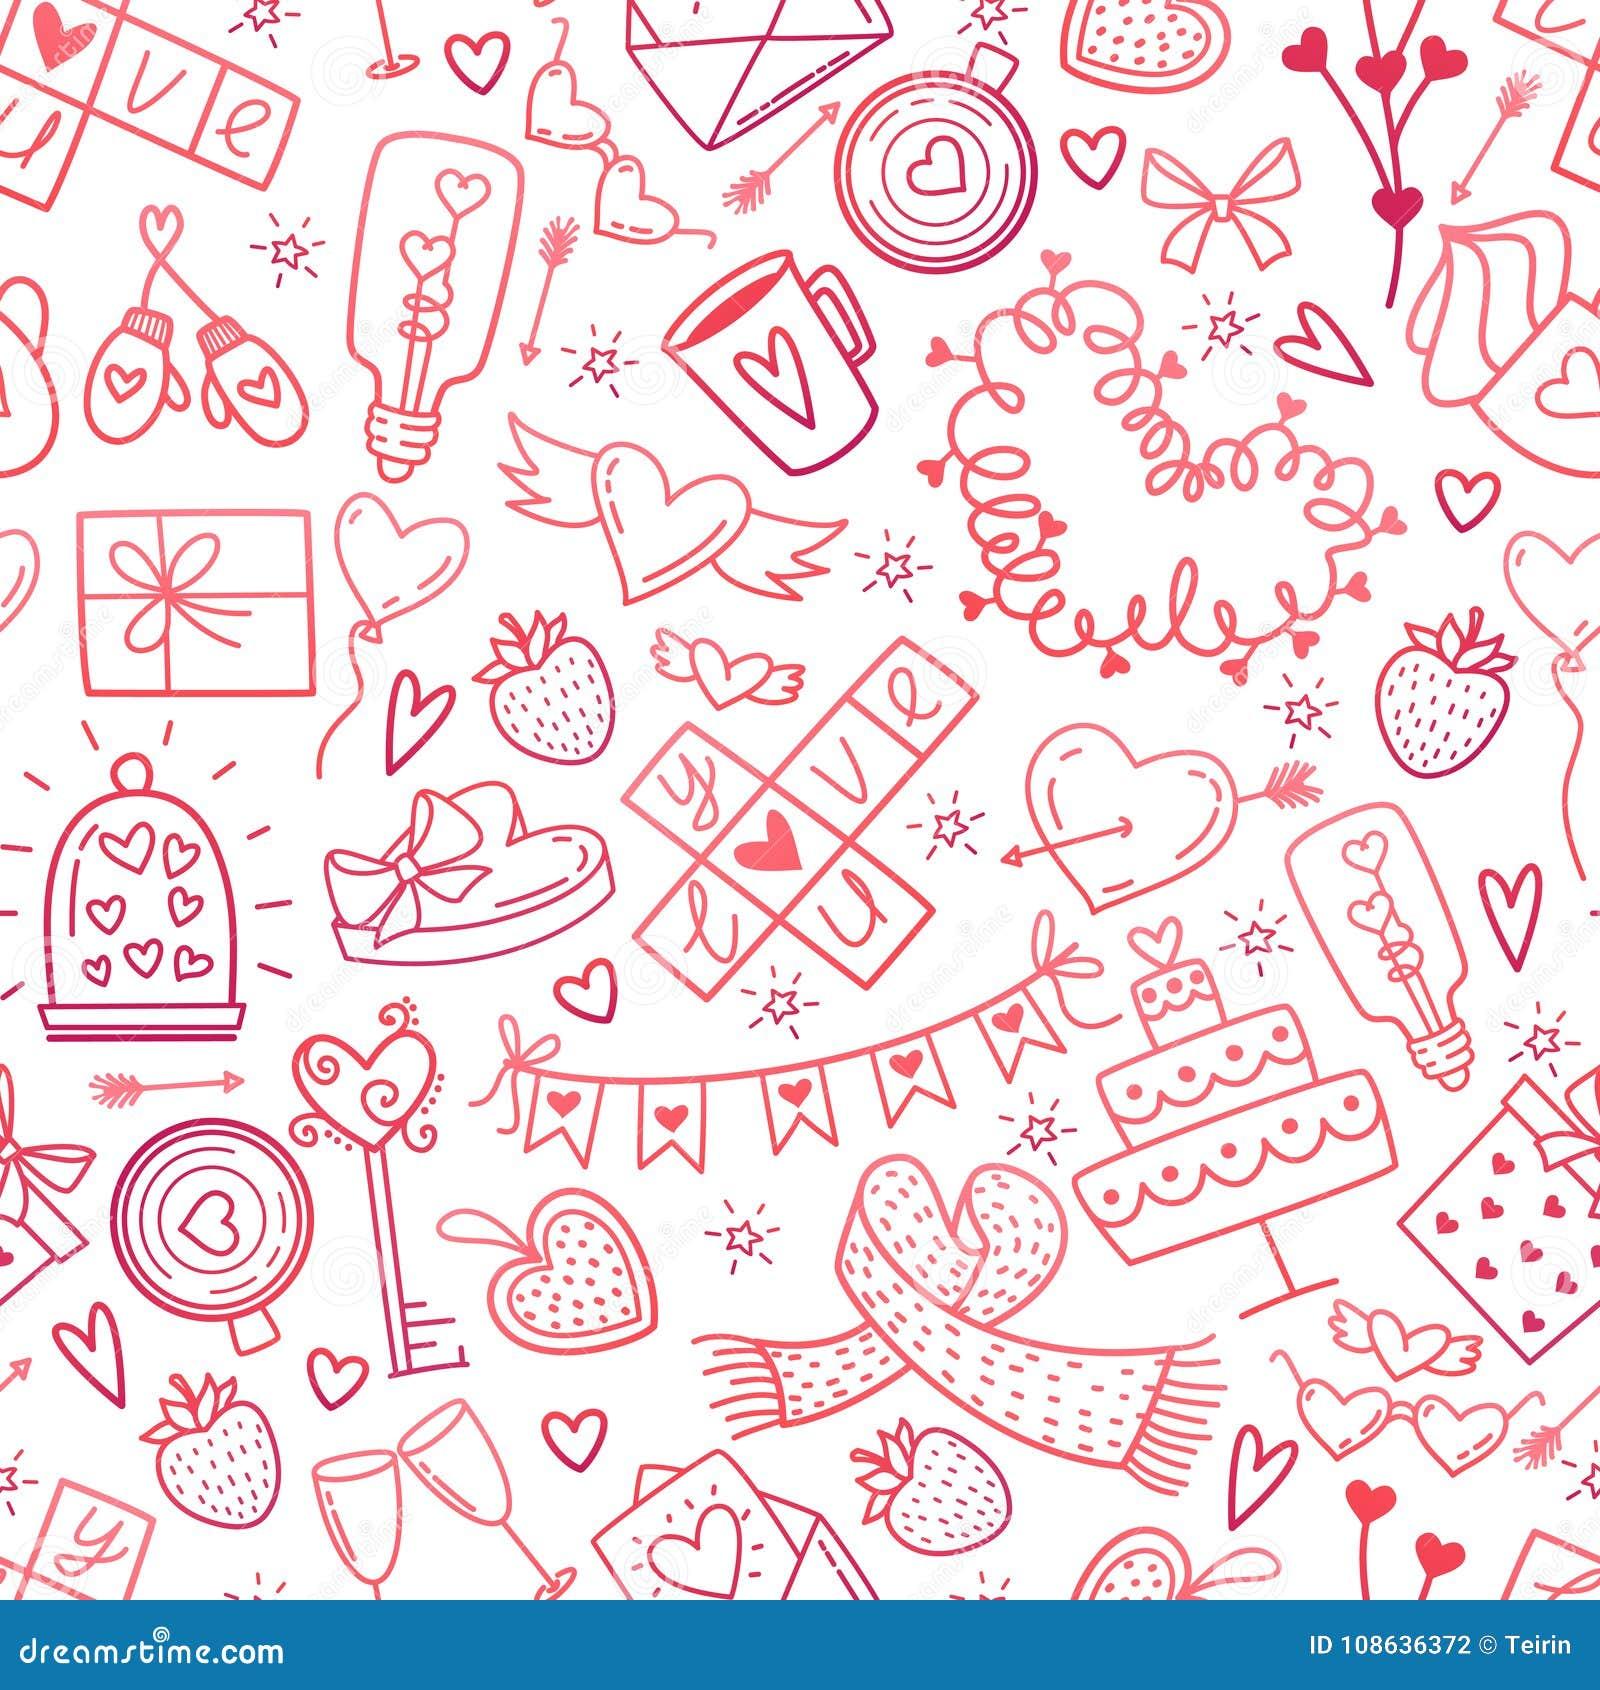 Valentine Day Doodles Elements Pattern Cute Symbols Of Lovewedding